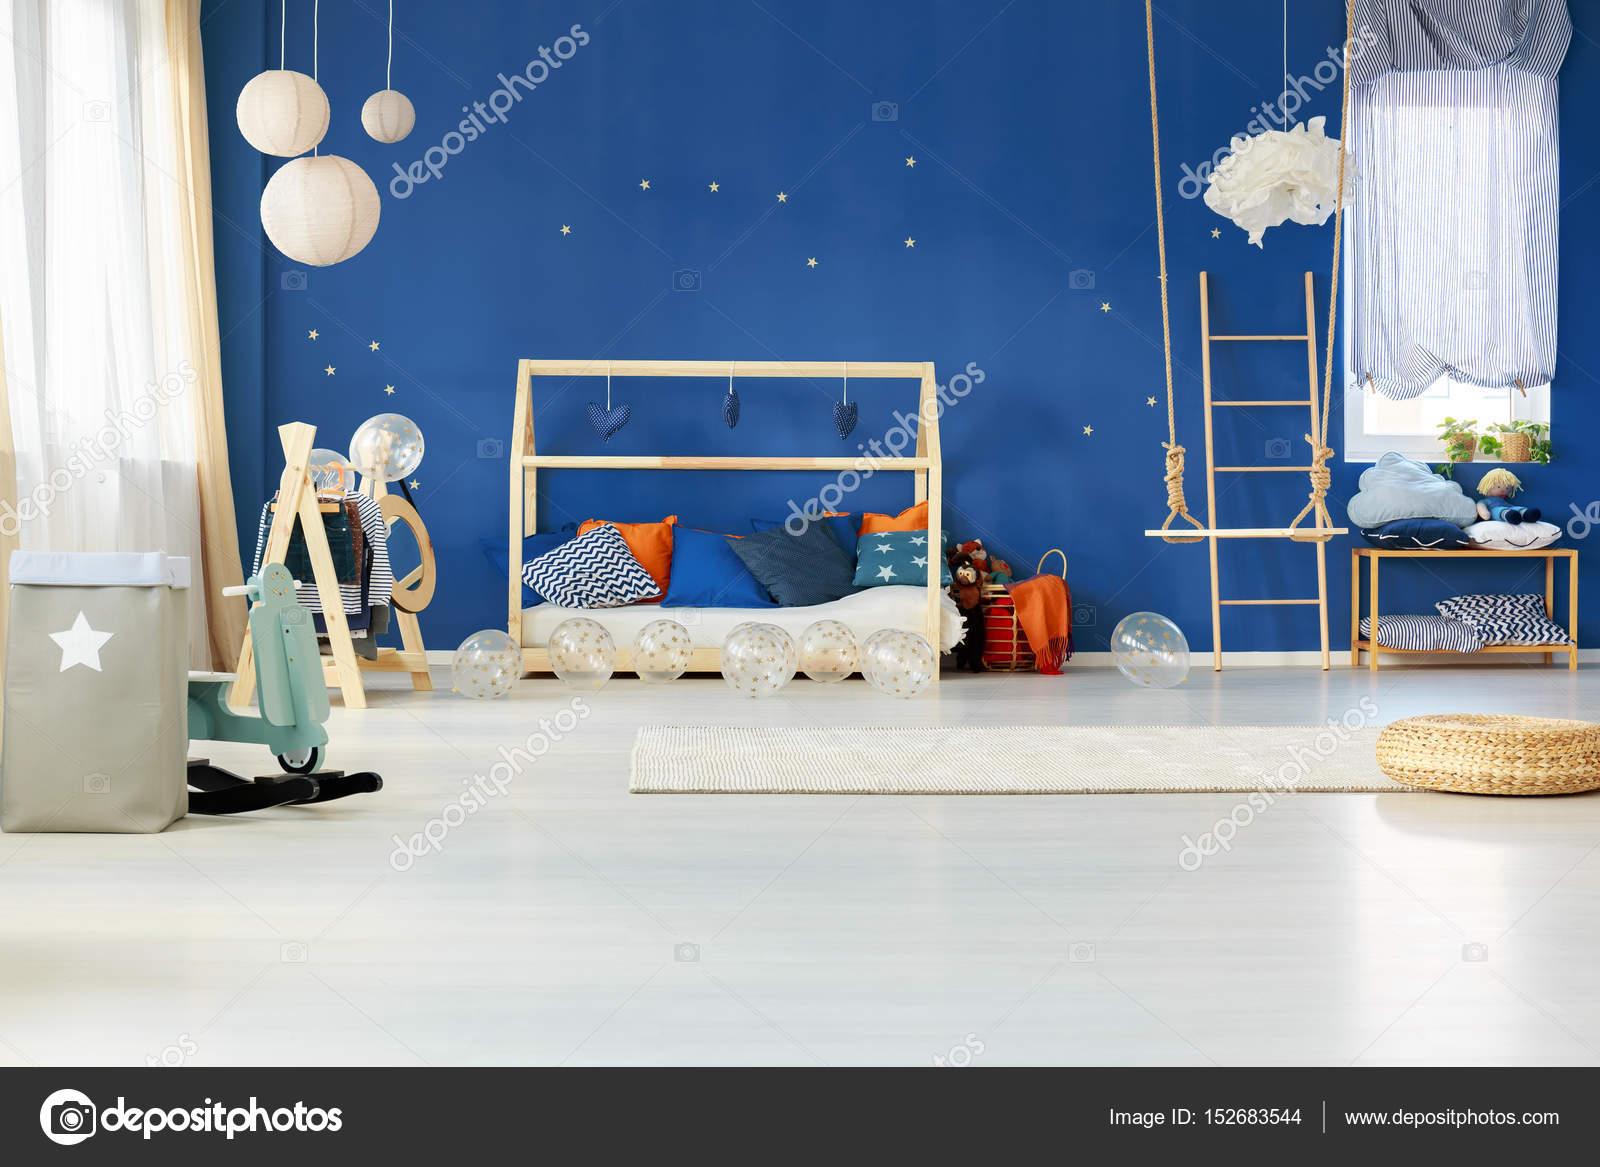 Camera Da Letto Da Sogno : Camera da letto da sogno con parete blu u foto stock